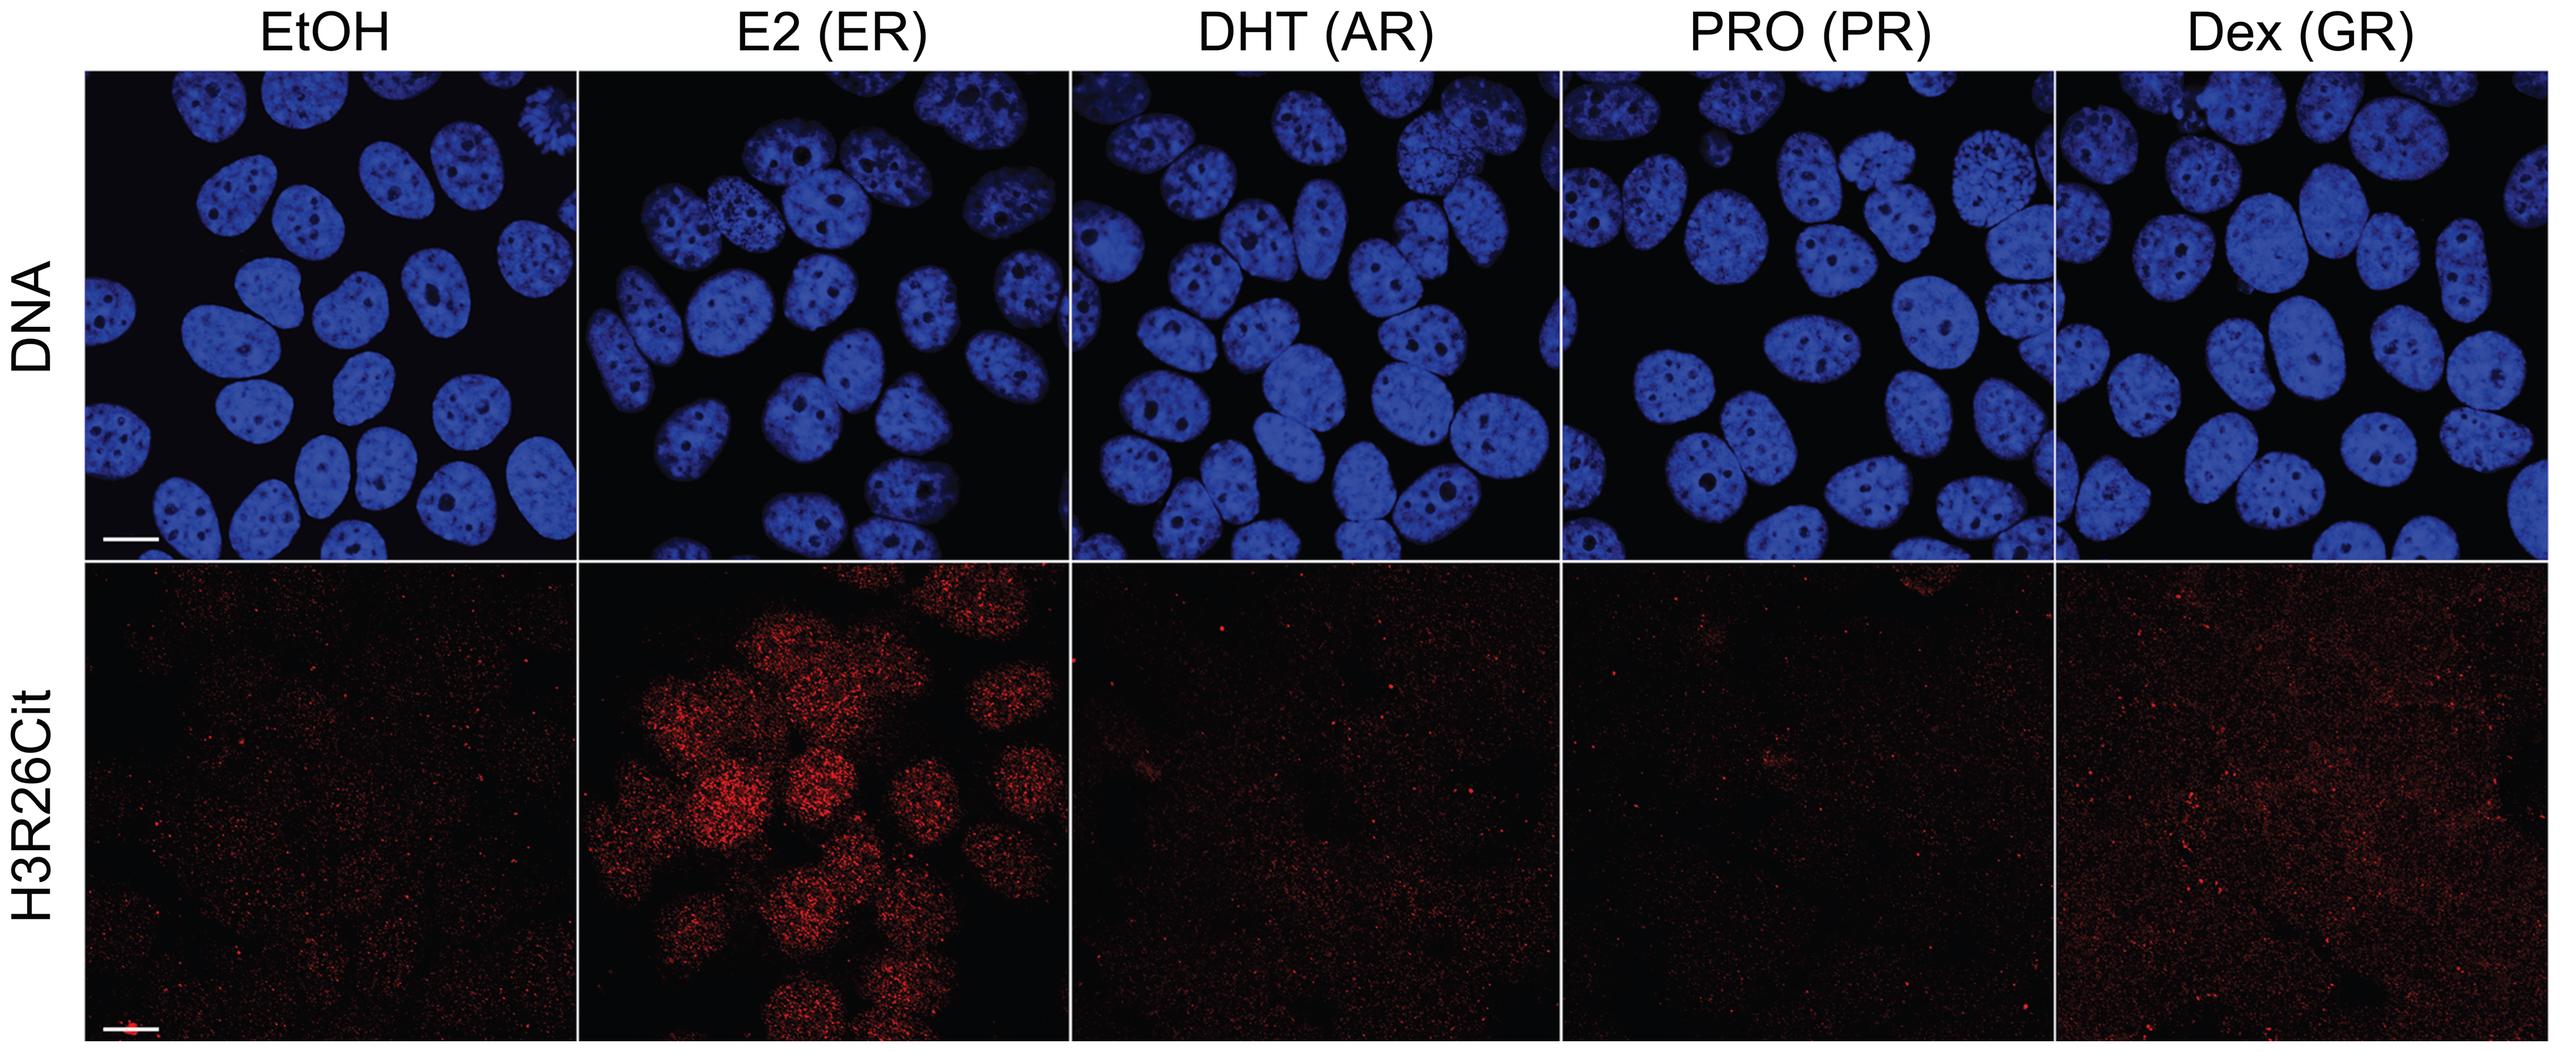 Hormone-induced H3R26Cit is unique to estradiol.